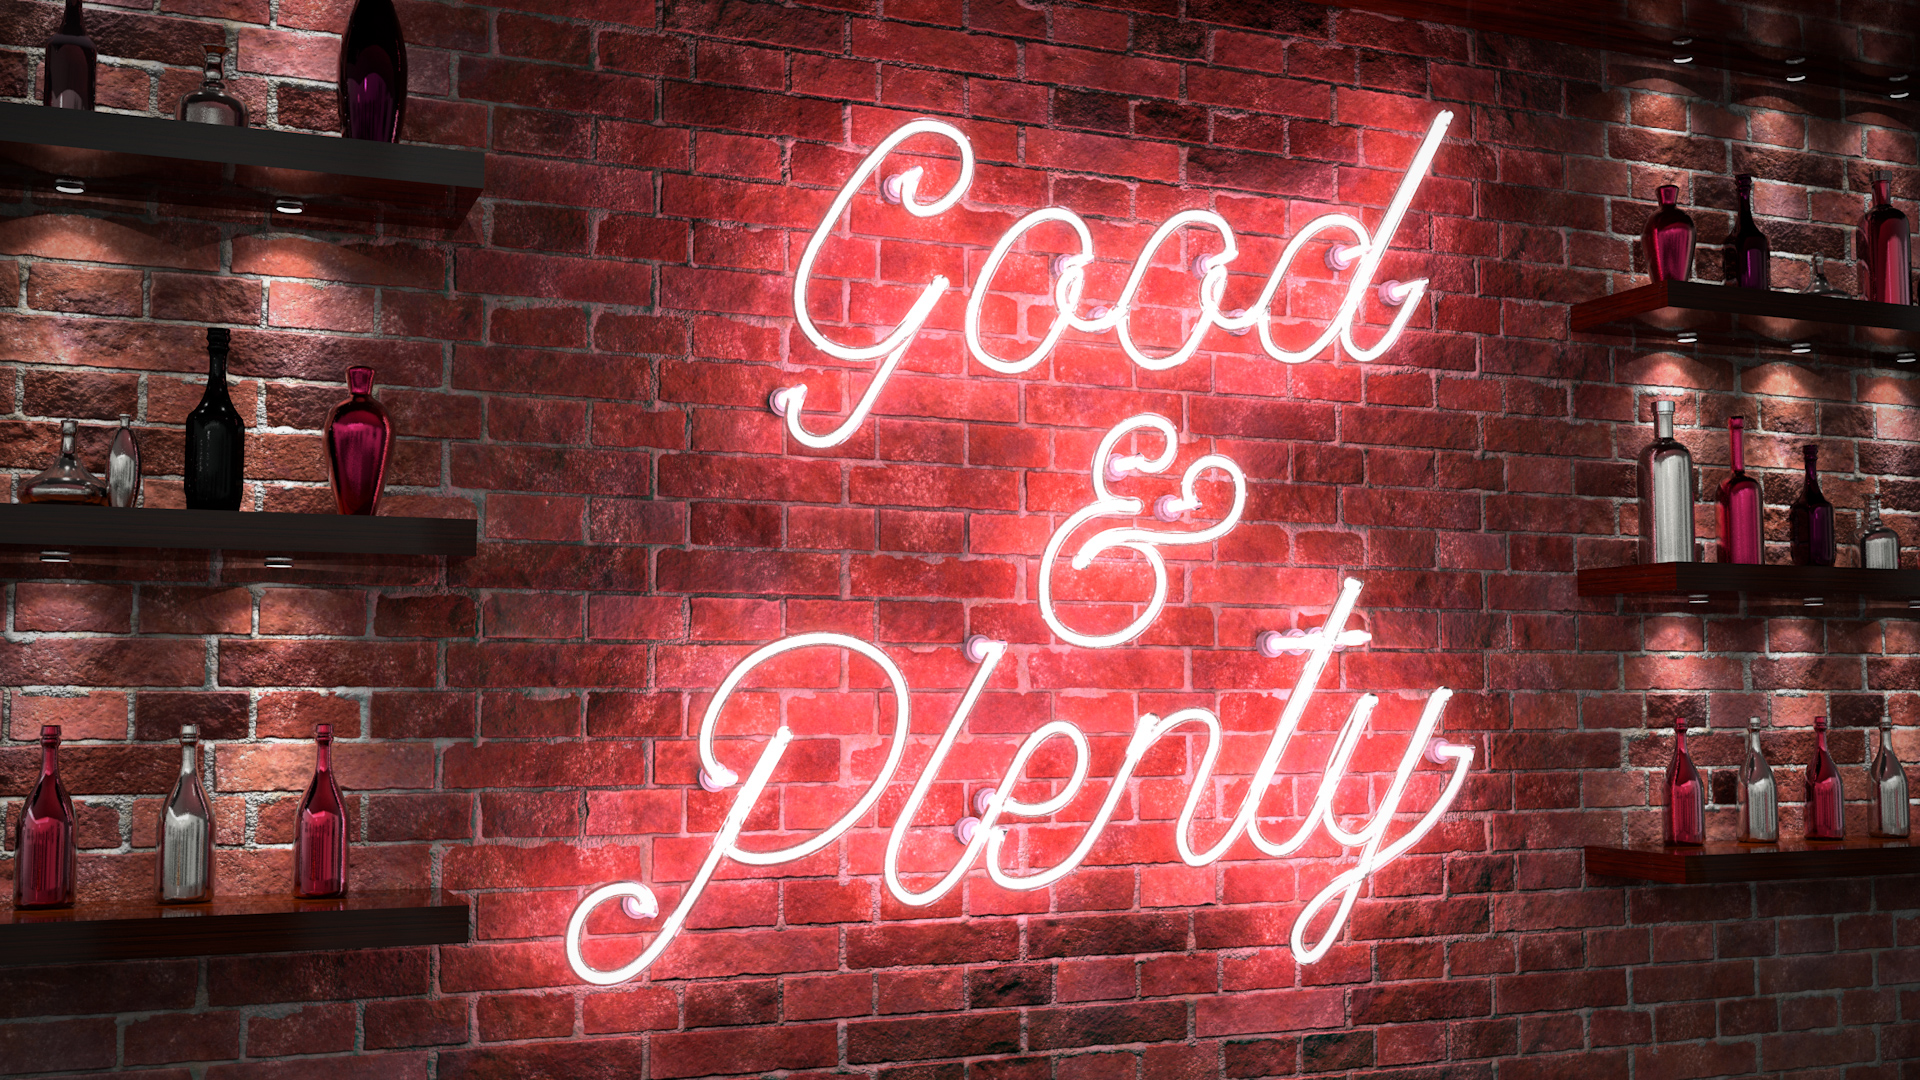 GoodAndPlenty_Neon.jpg